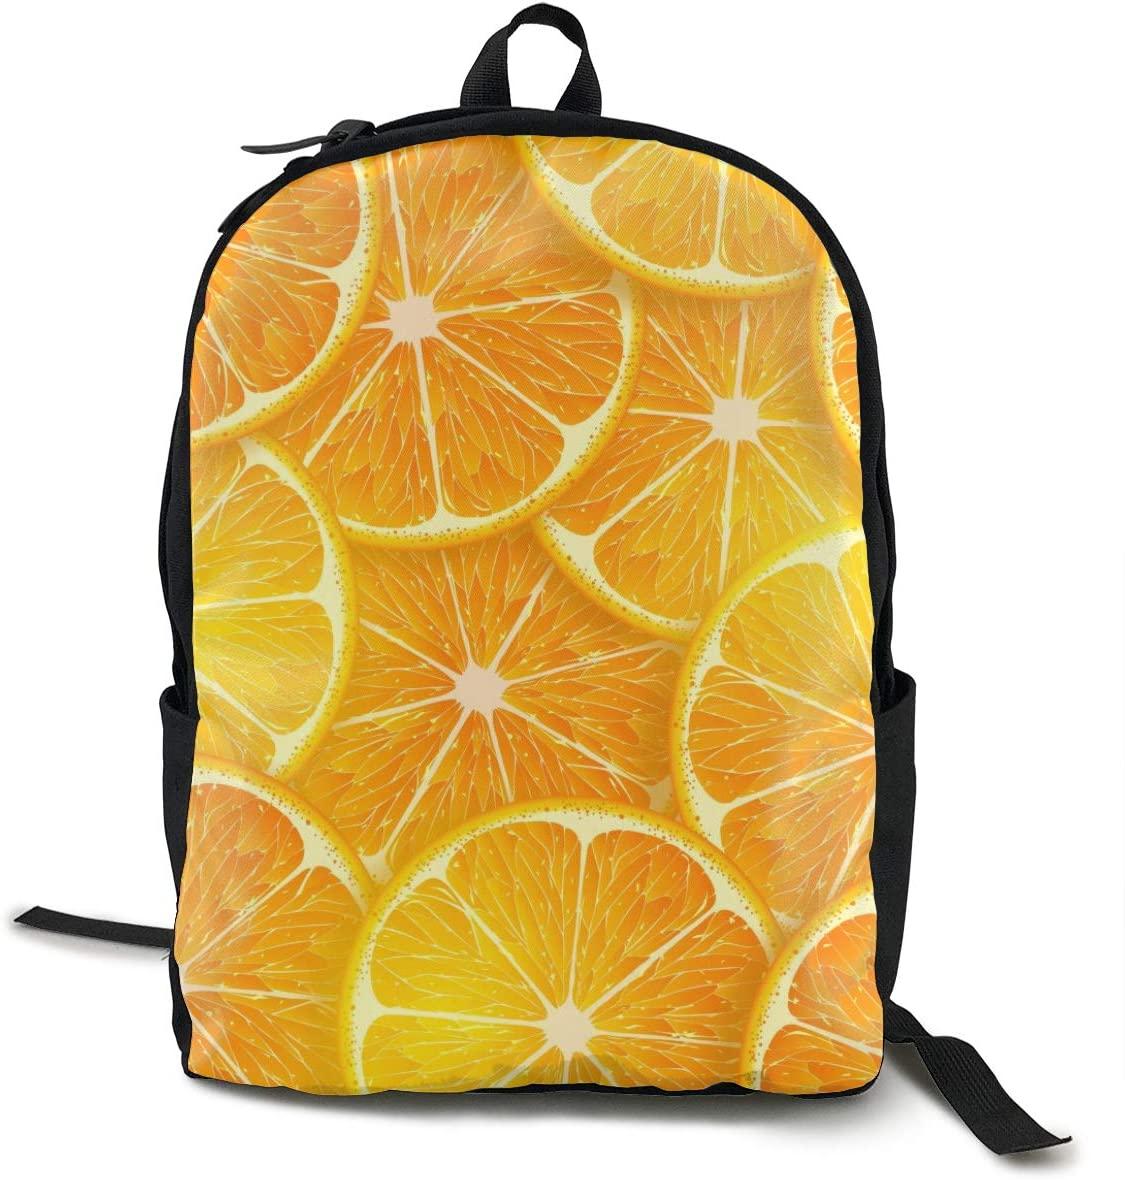 NiYoung Men Women Laptop Backpack Business Travel Anti Theft Daypack Durable College School Bookbag Computer Backpack, Cartoon Cute Orange Lemon